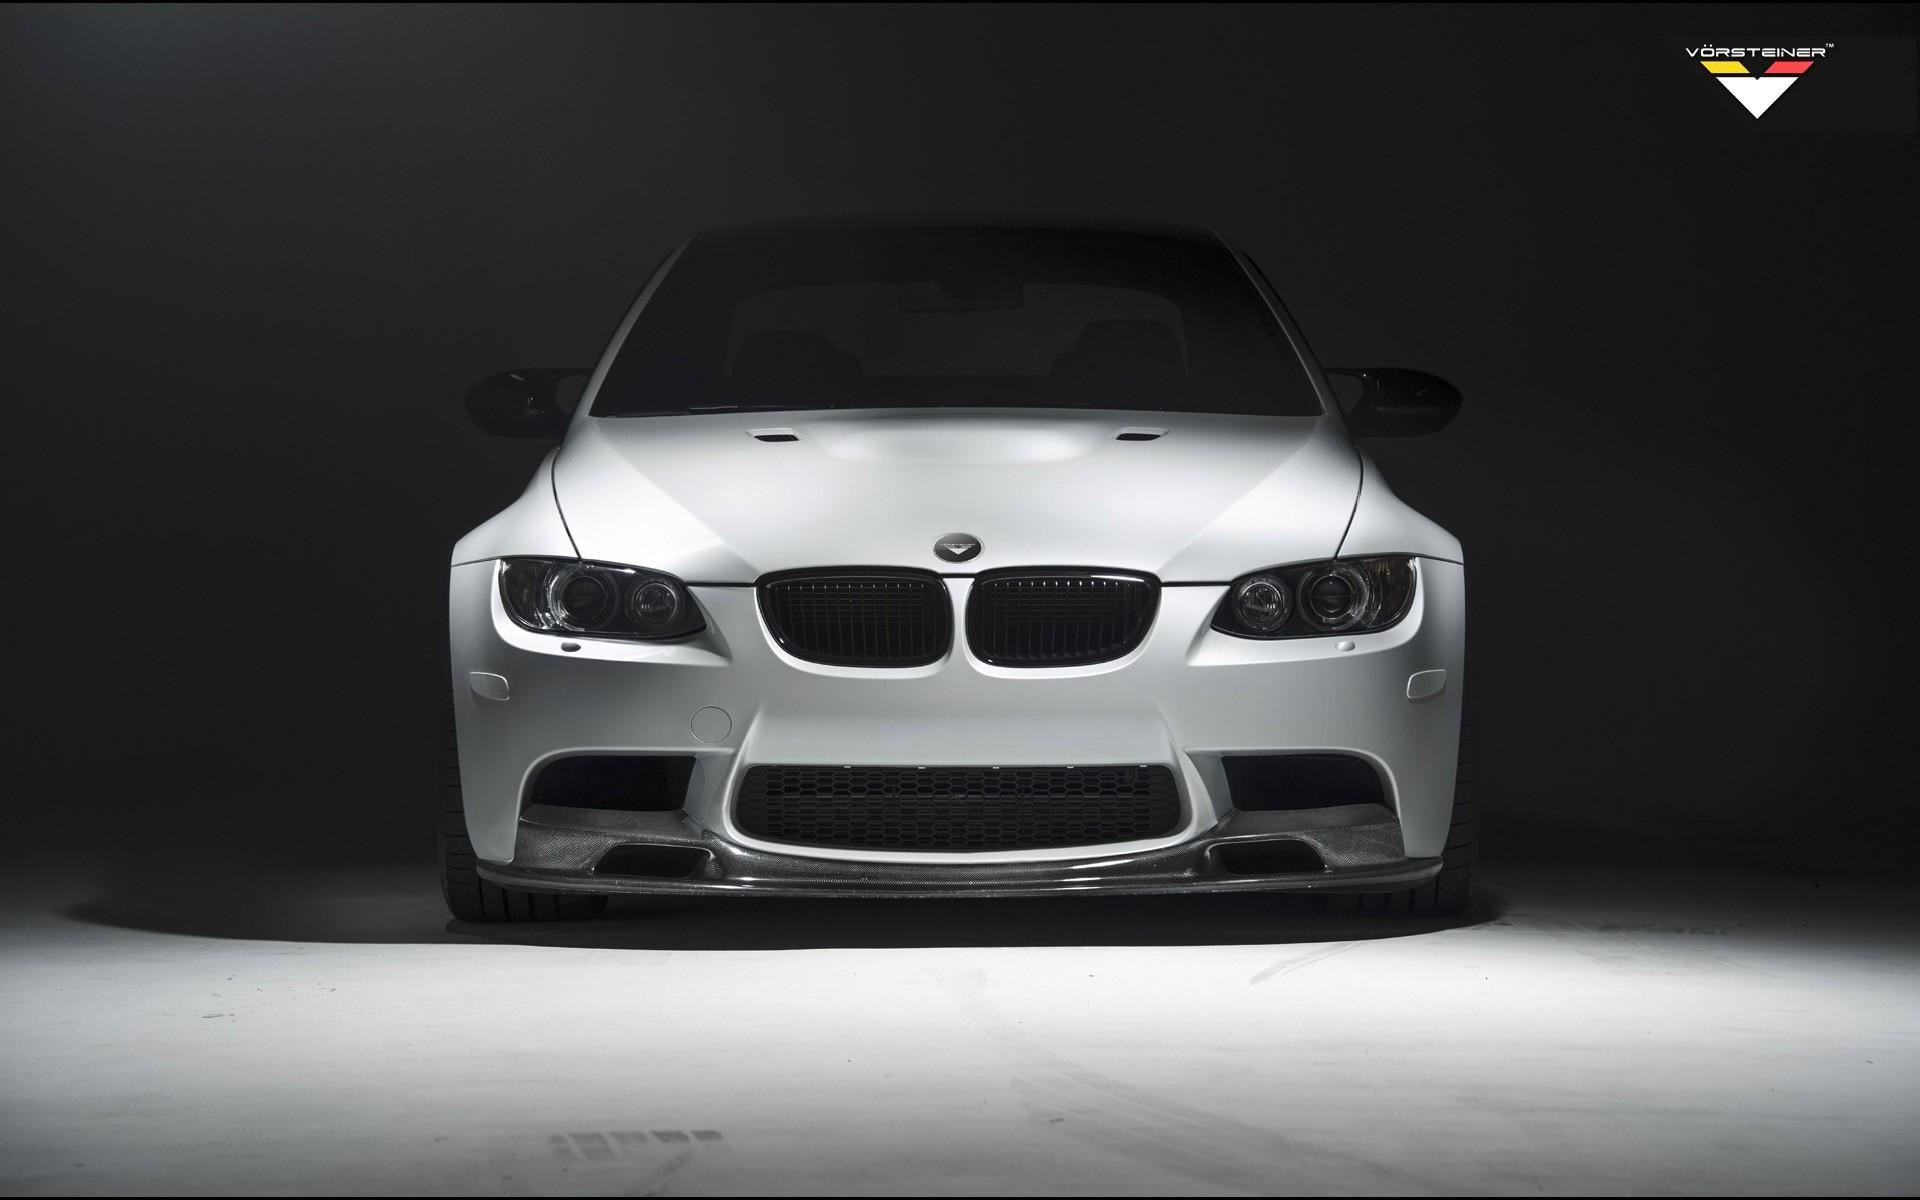 2014 Vorsteiner BMW E92 M3 Wallpaper   HD Car Wallpapers ...